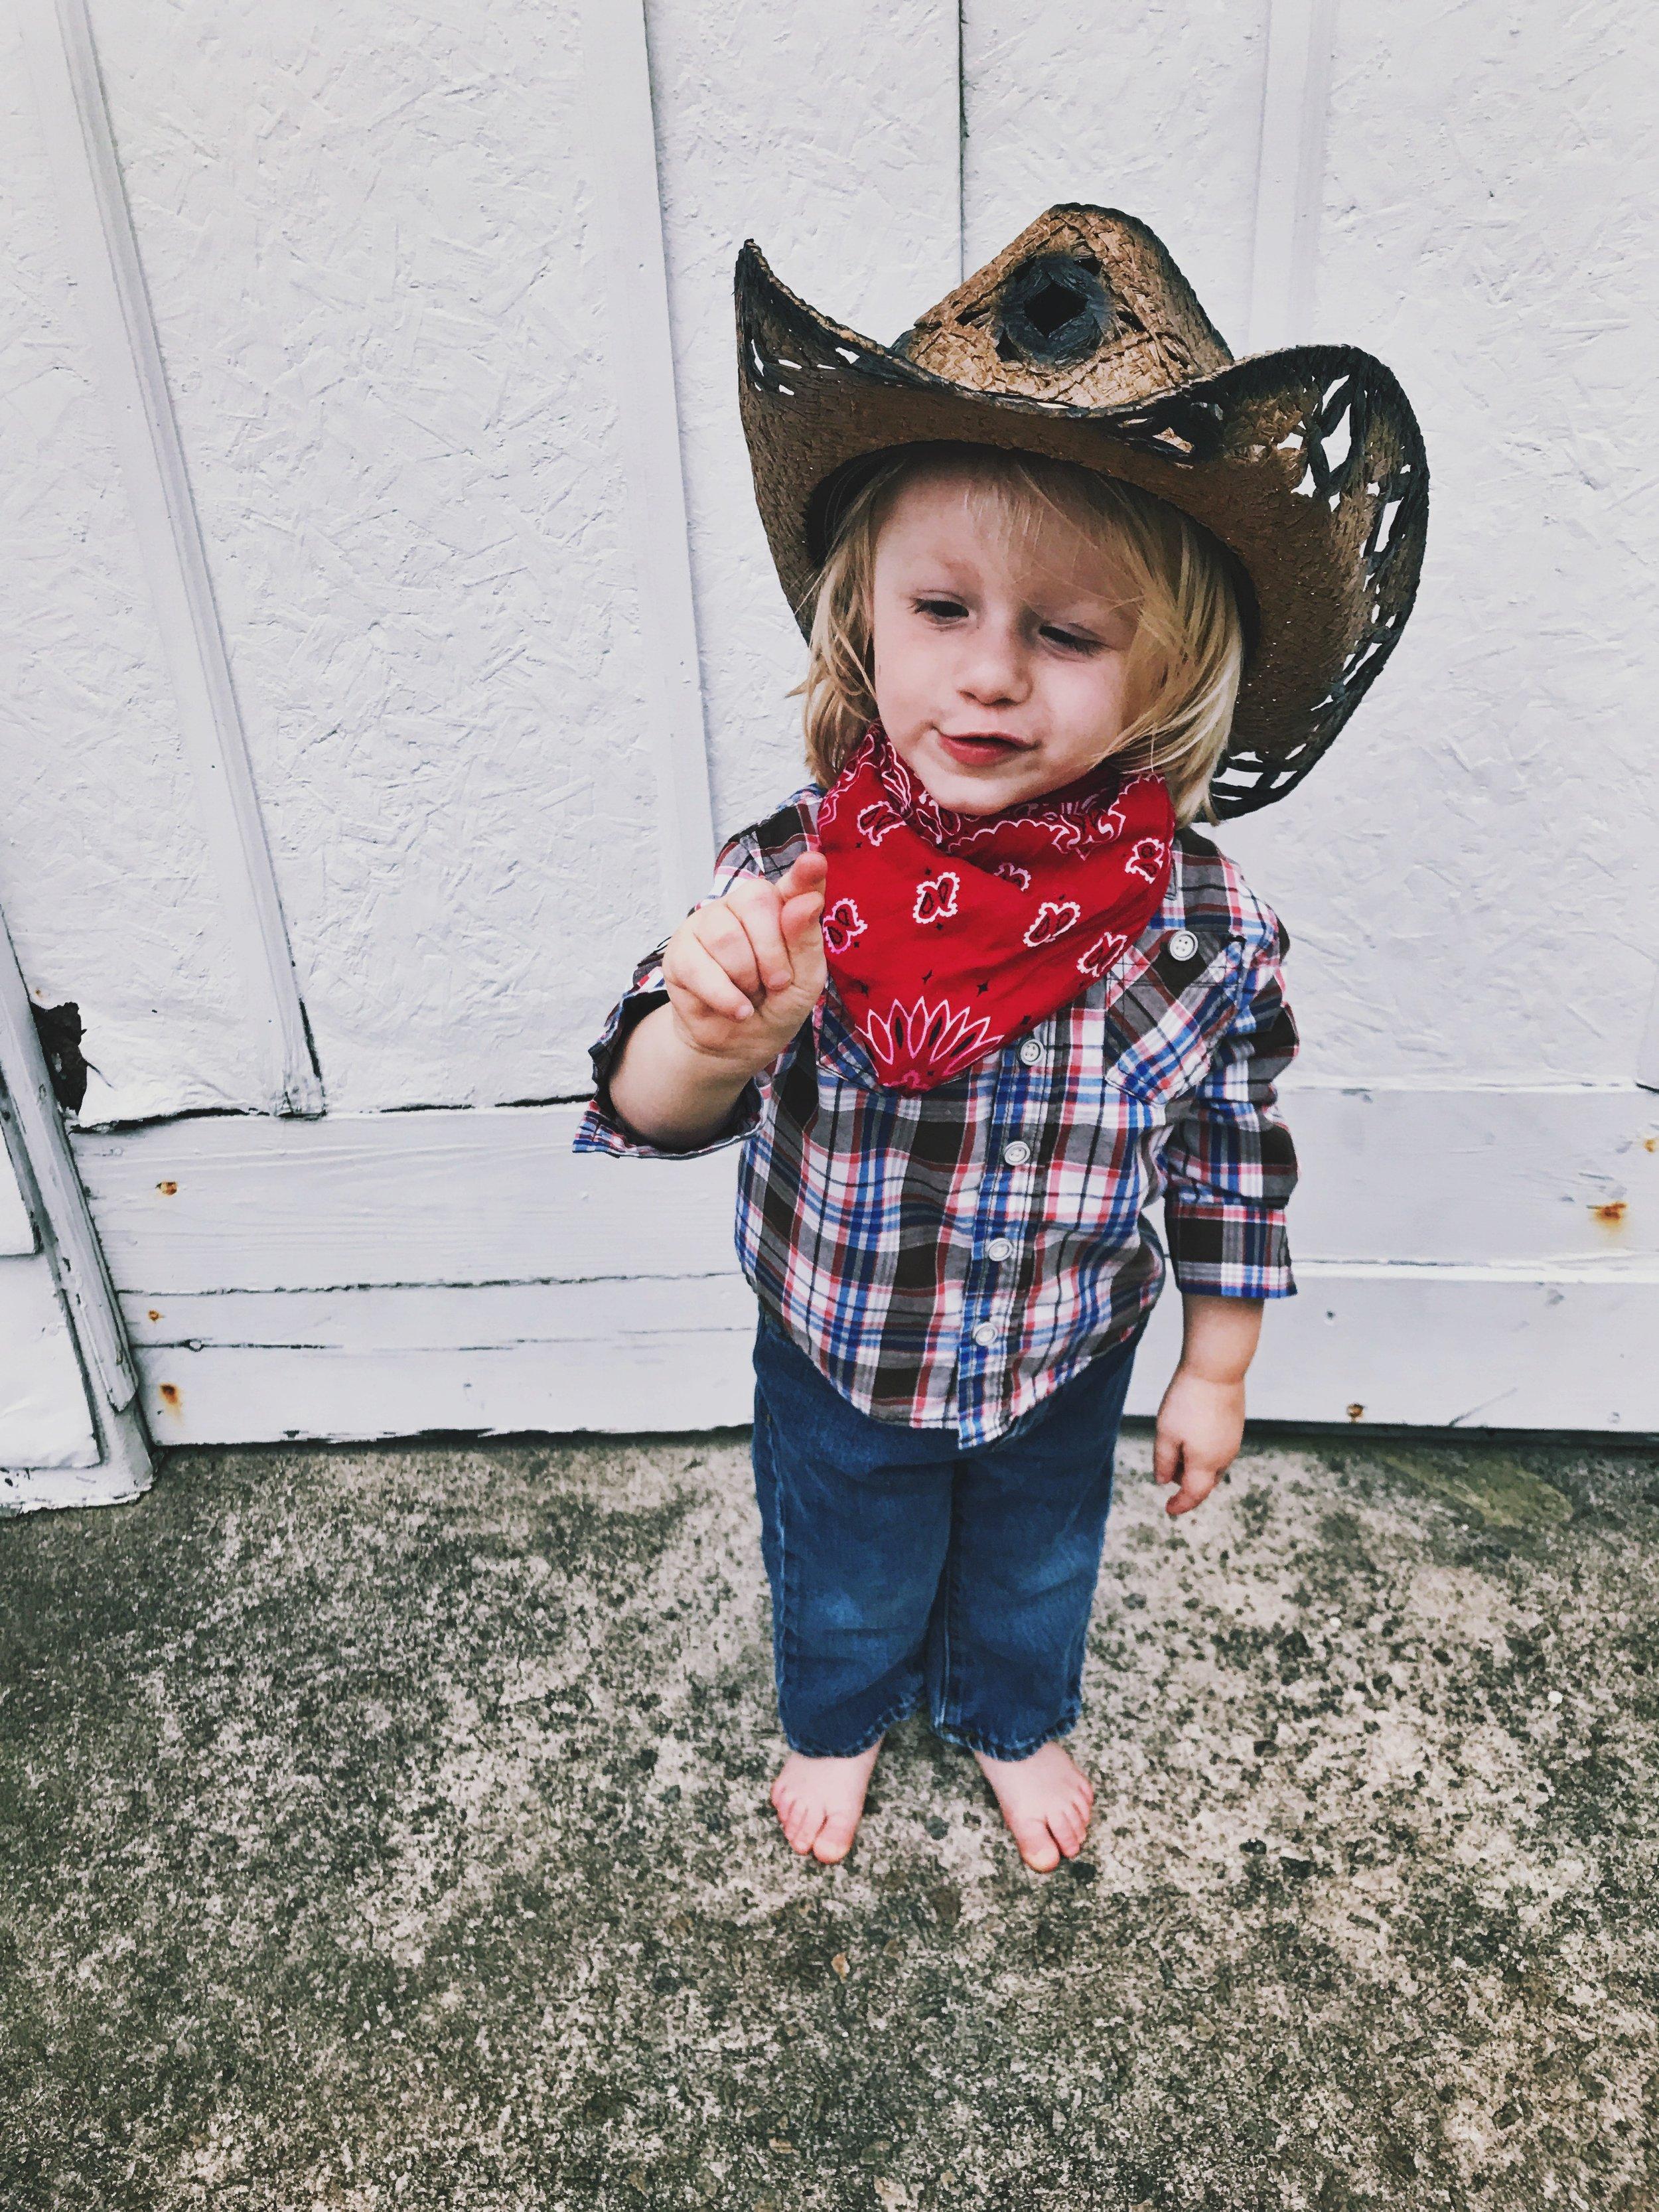 Just needs cowboy boots!